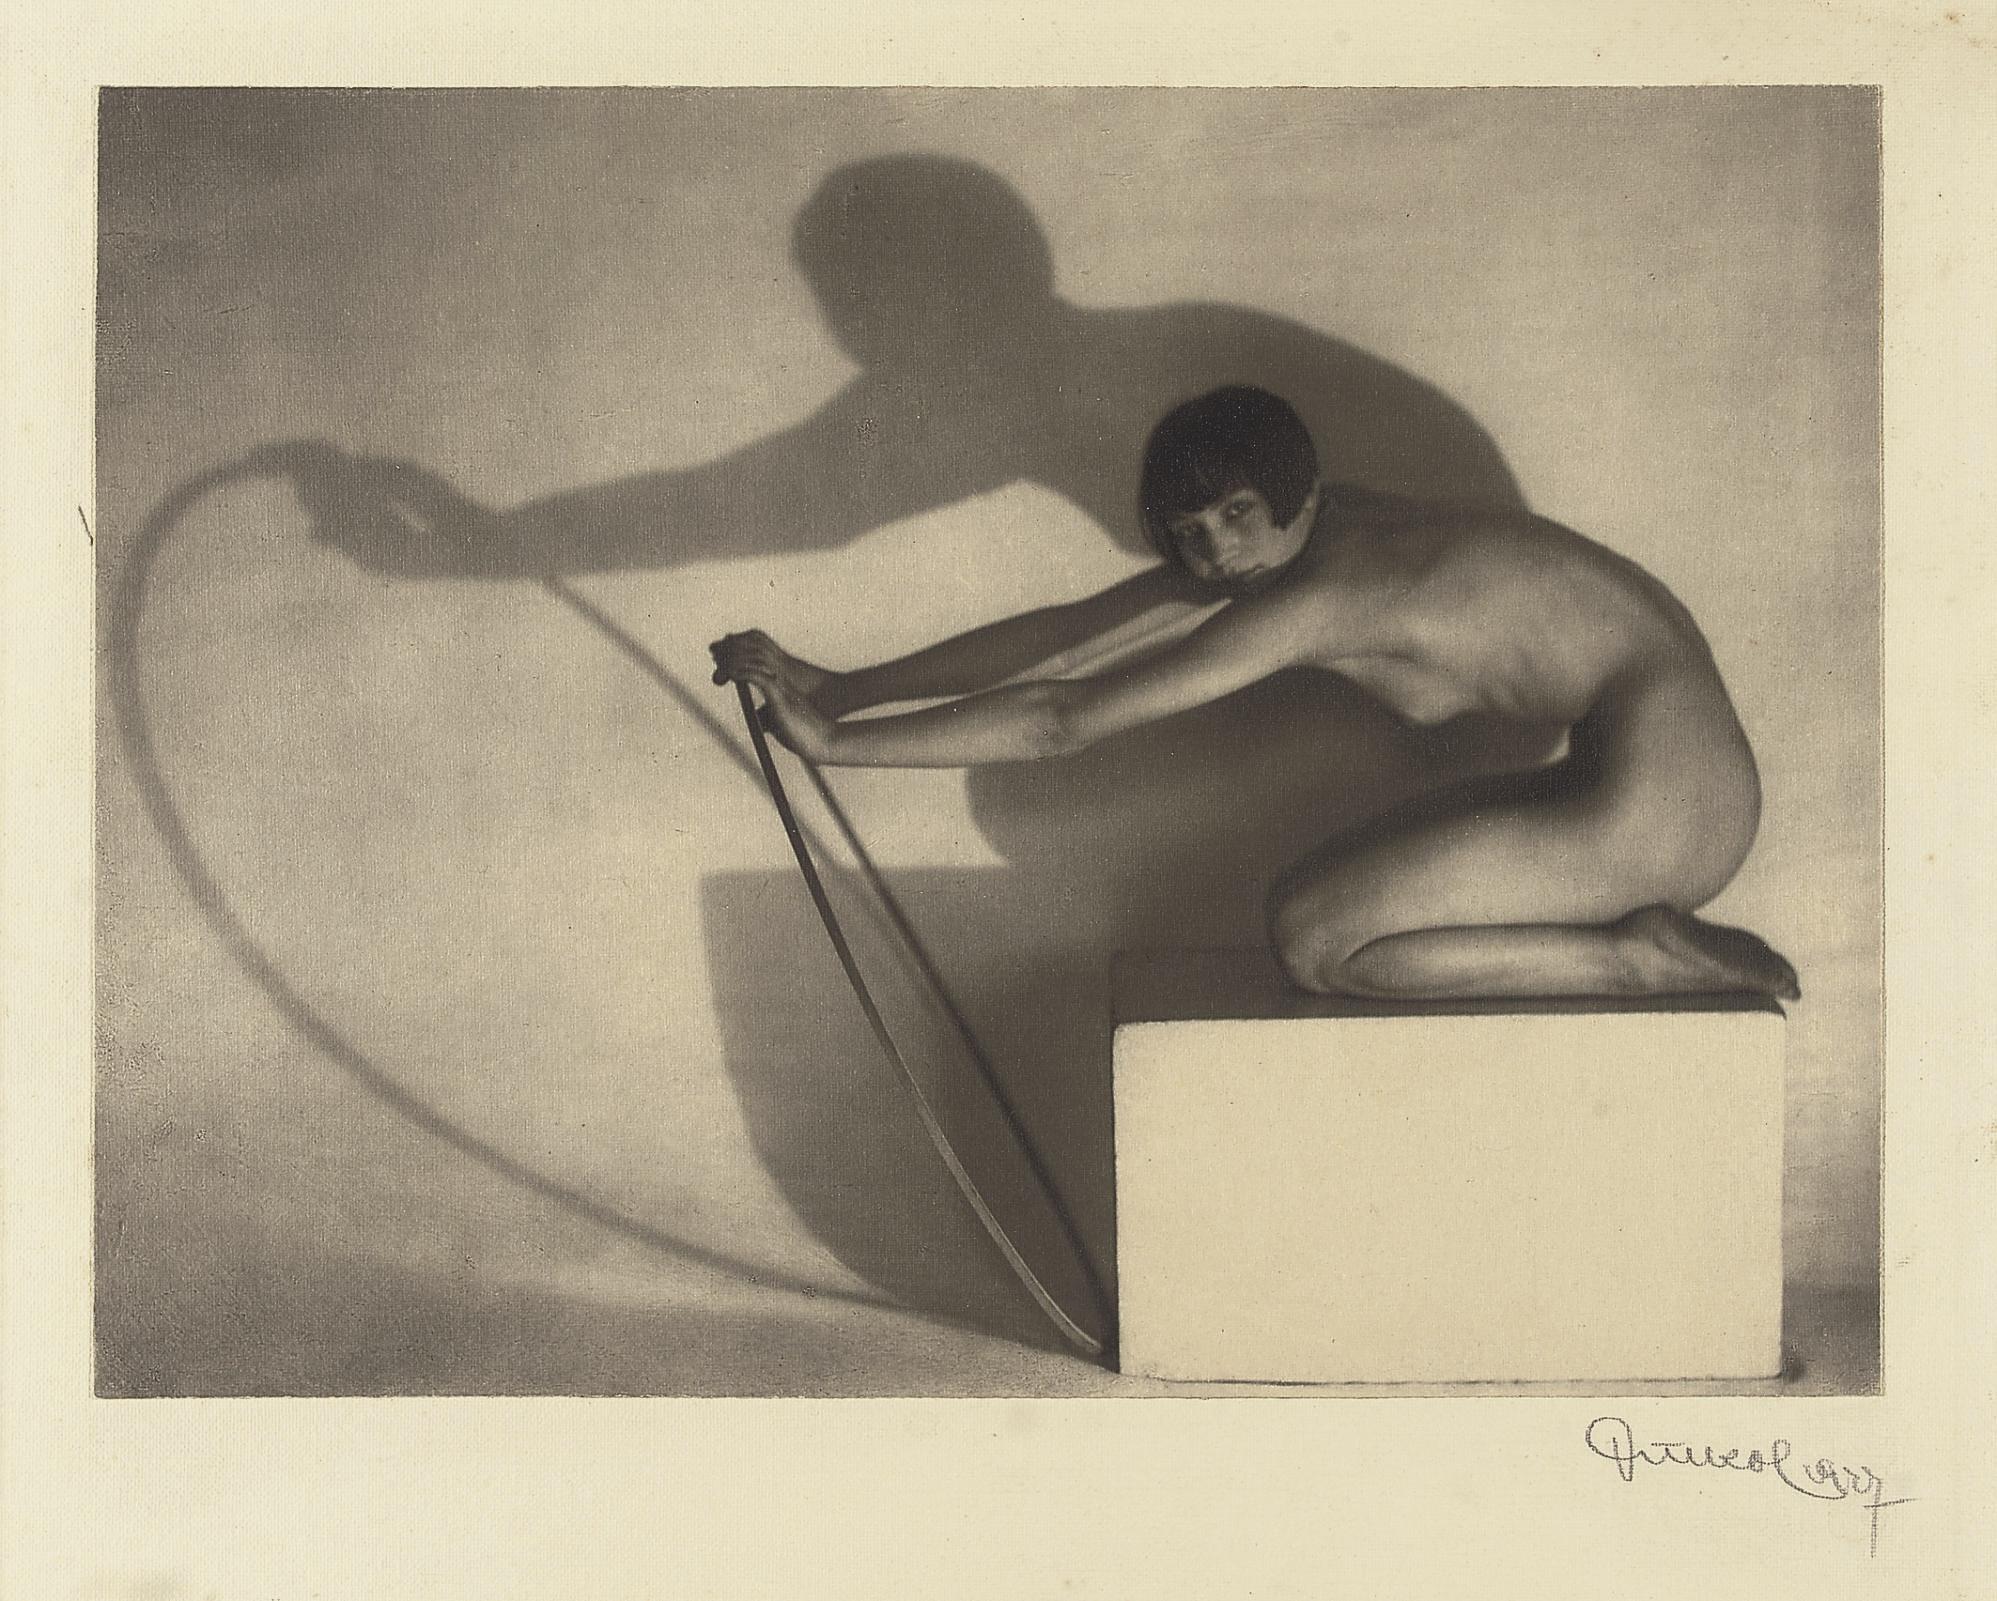 Nude with Hoop, 1927